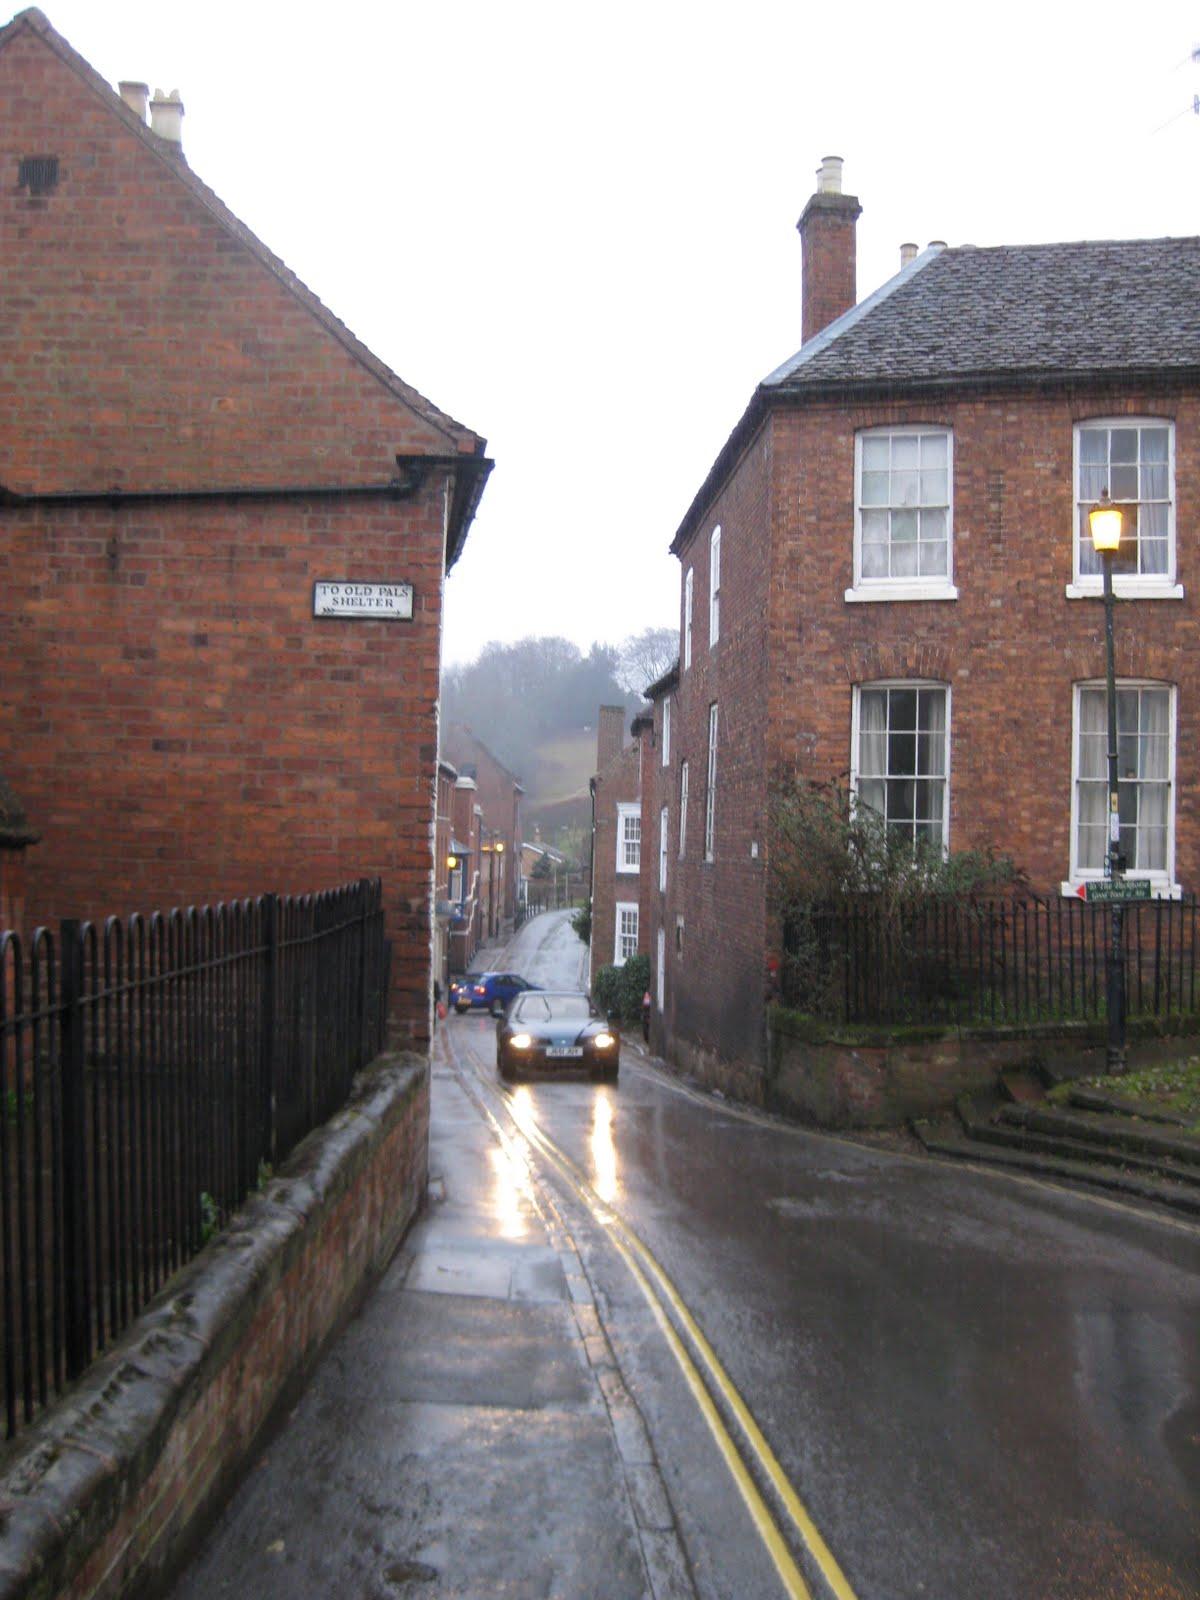 Narrow streets in Bewdley